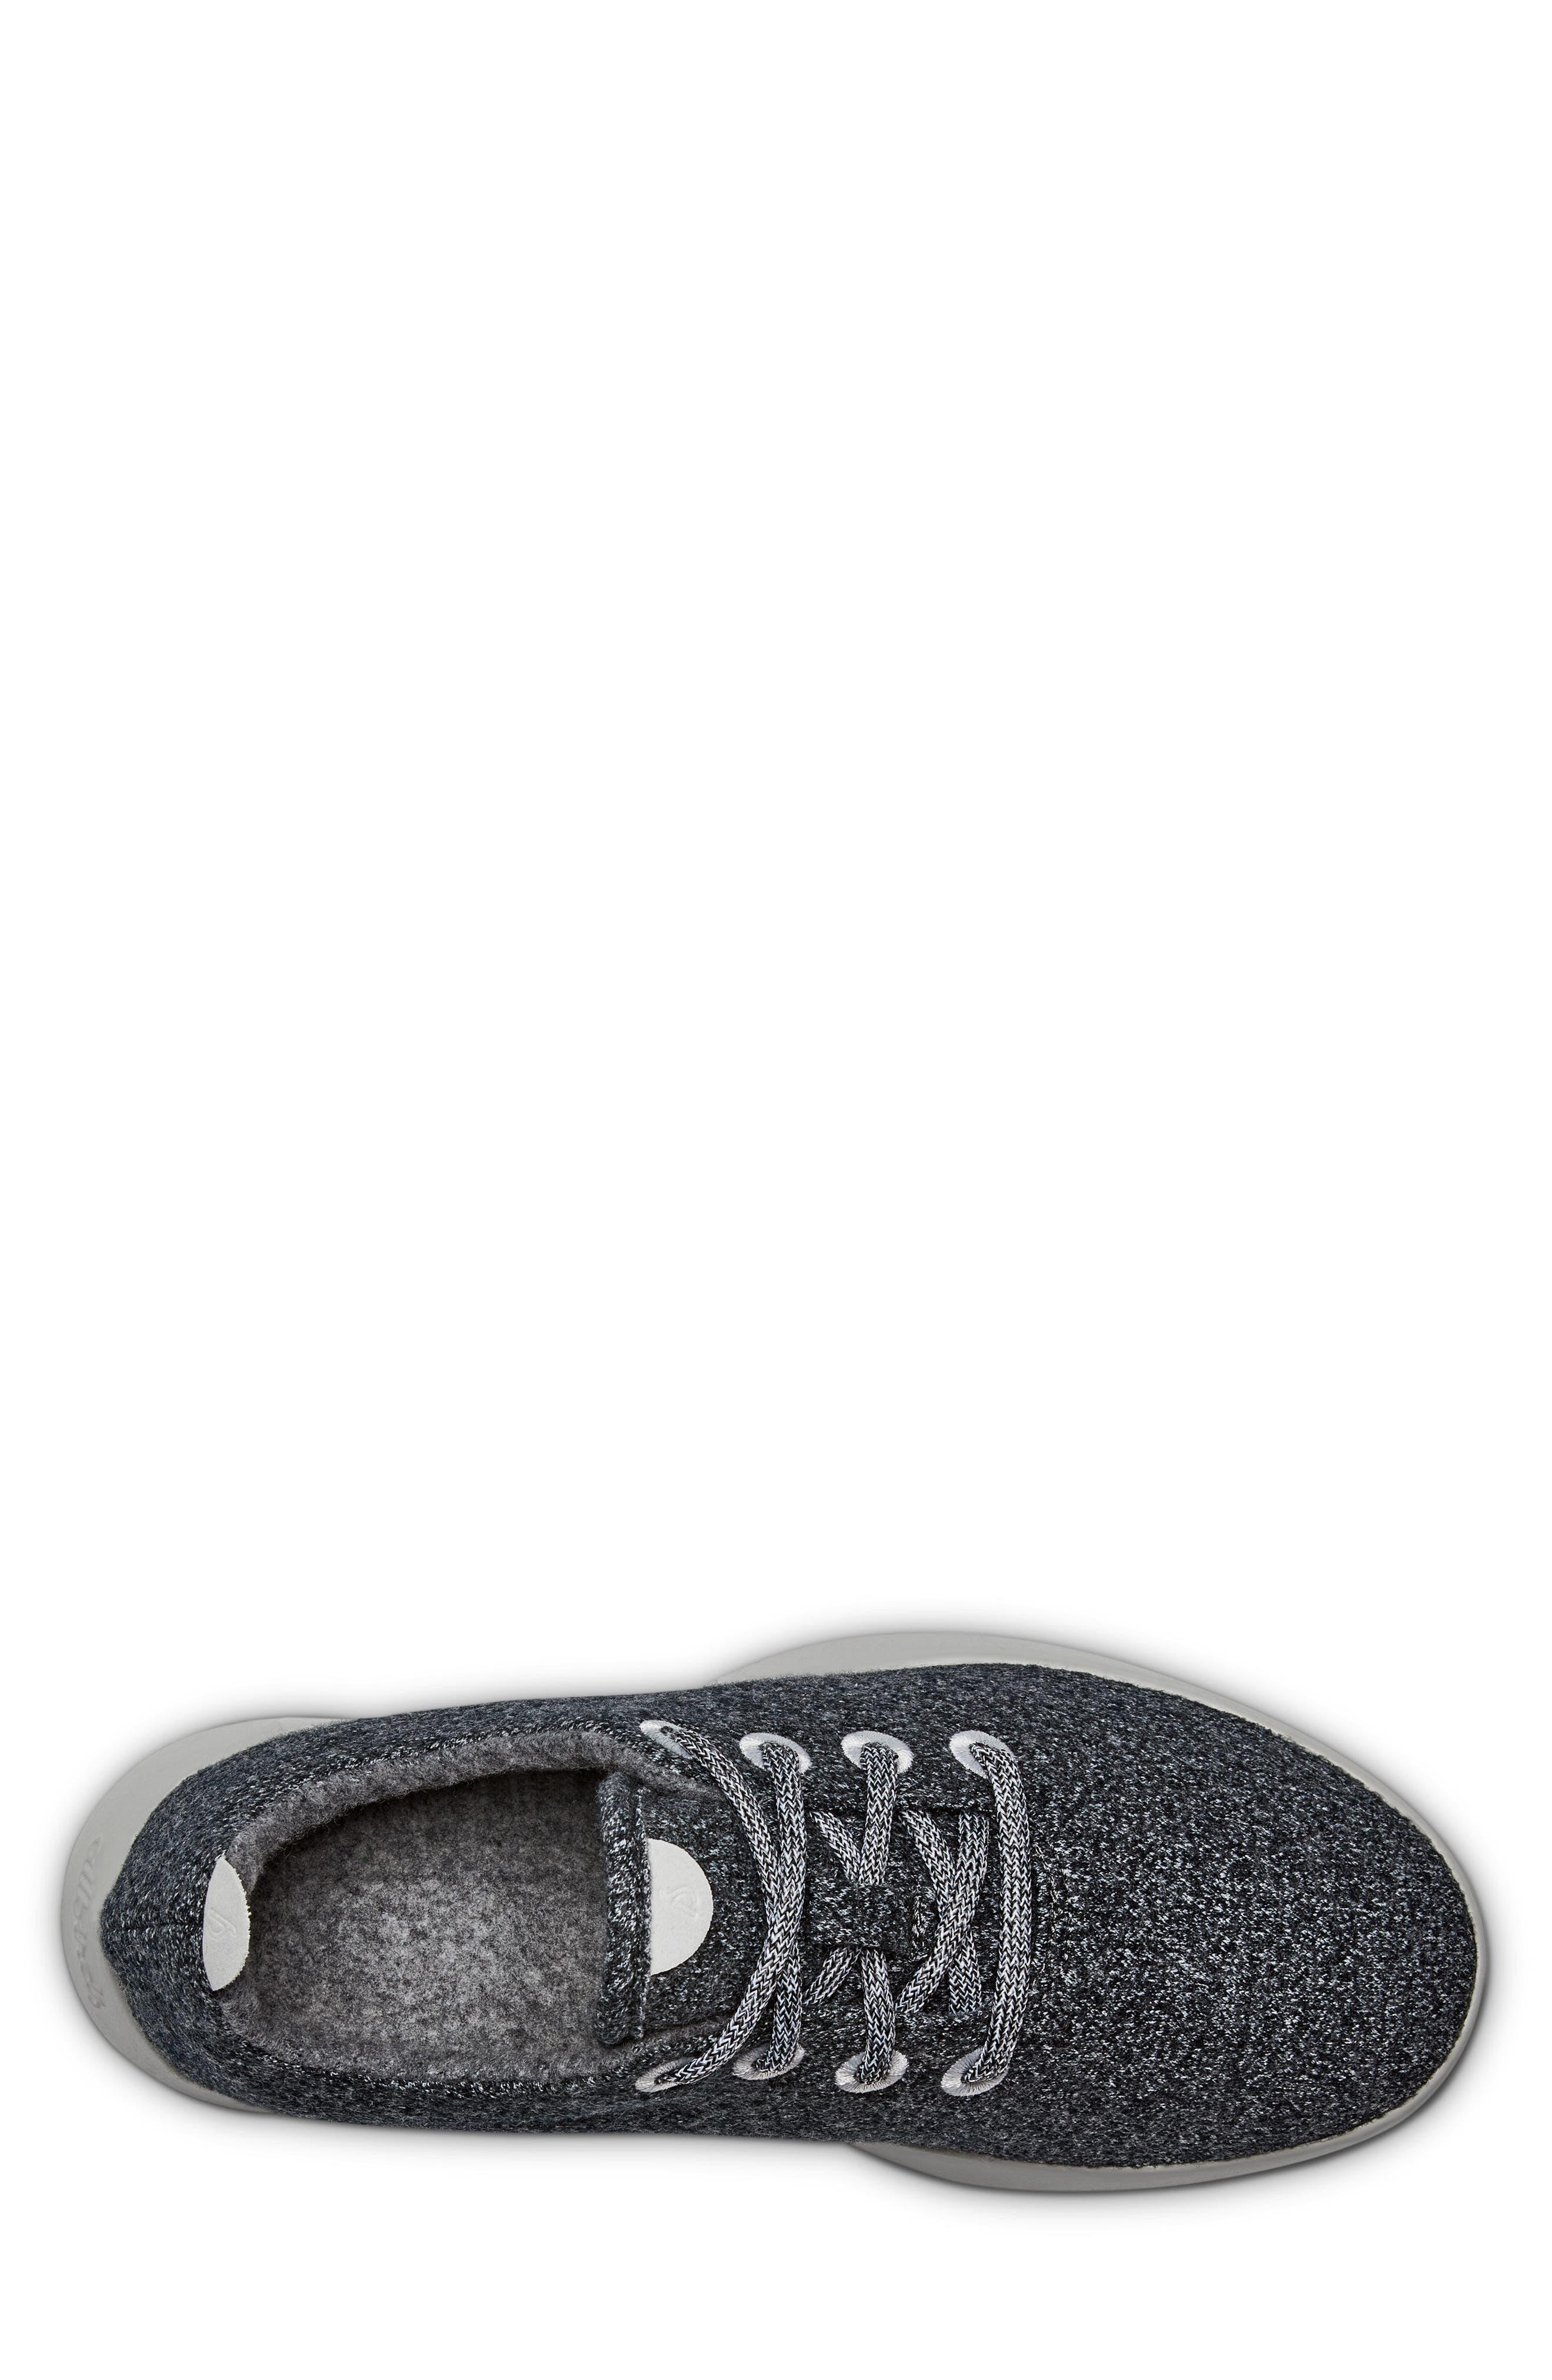 Wool Runner,                             Alternate thumbnail 4, color,                             Natural Grey